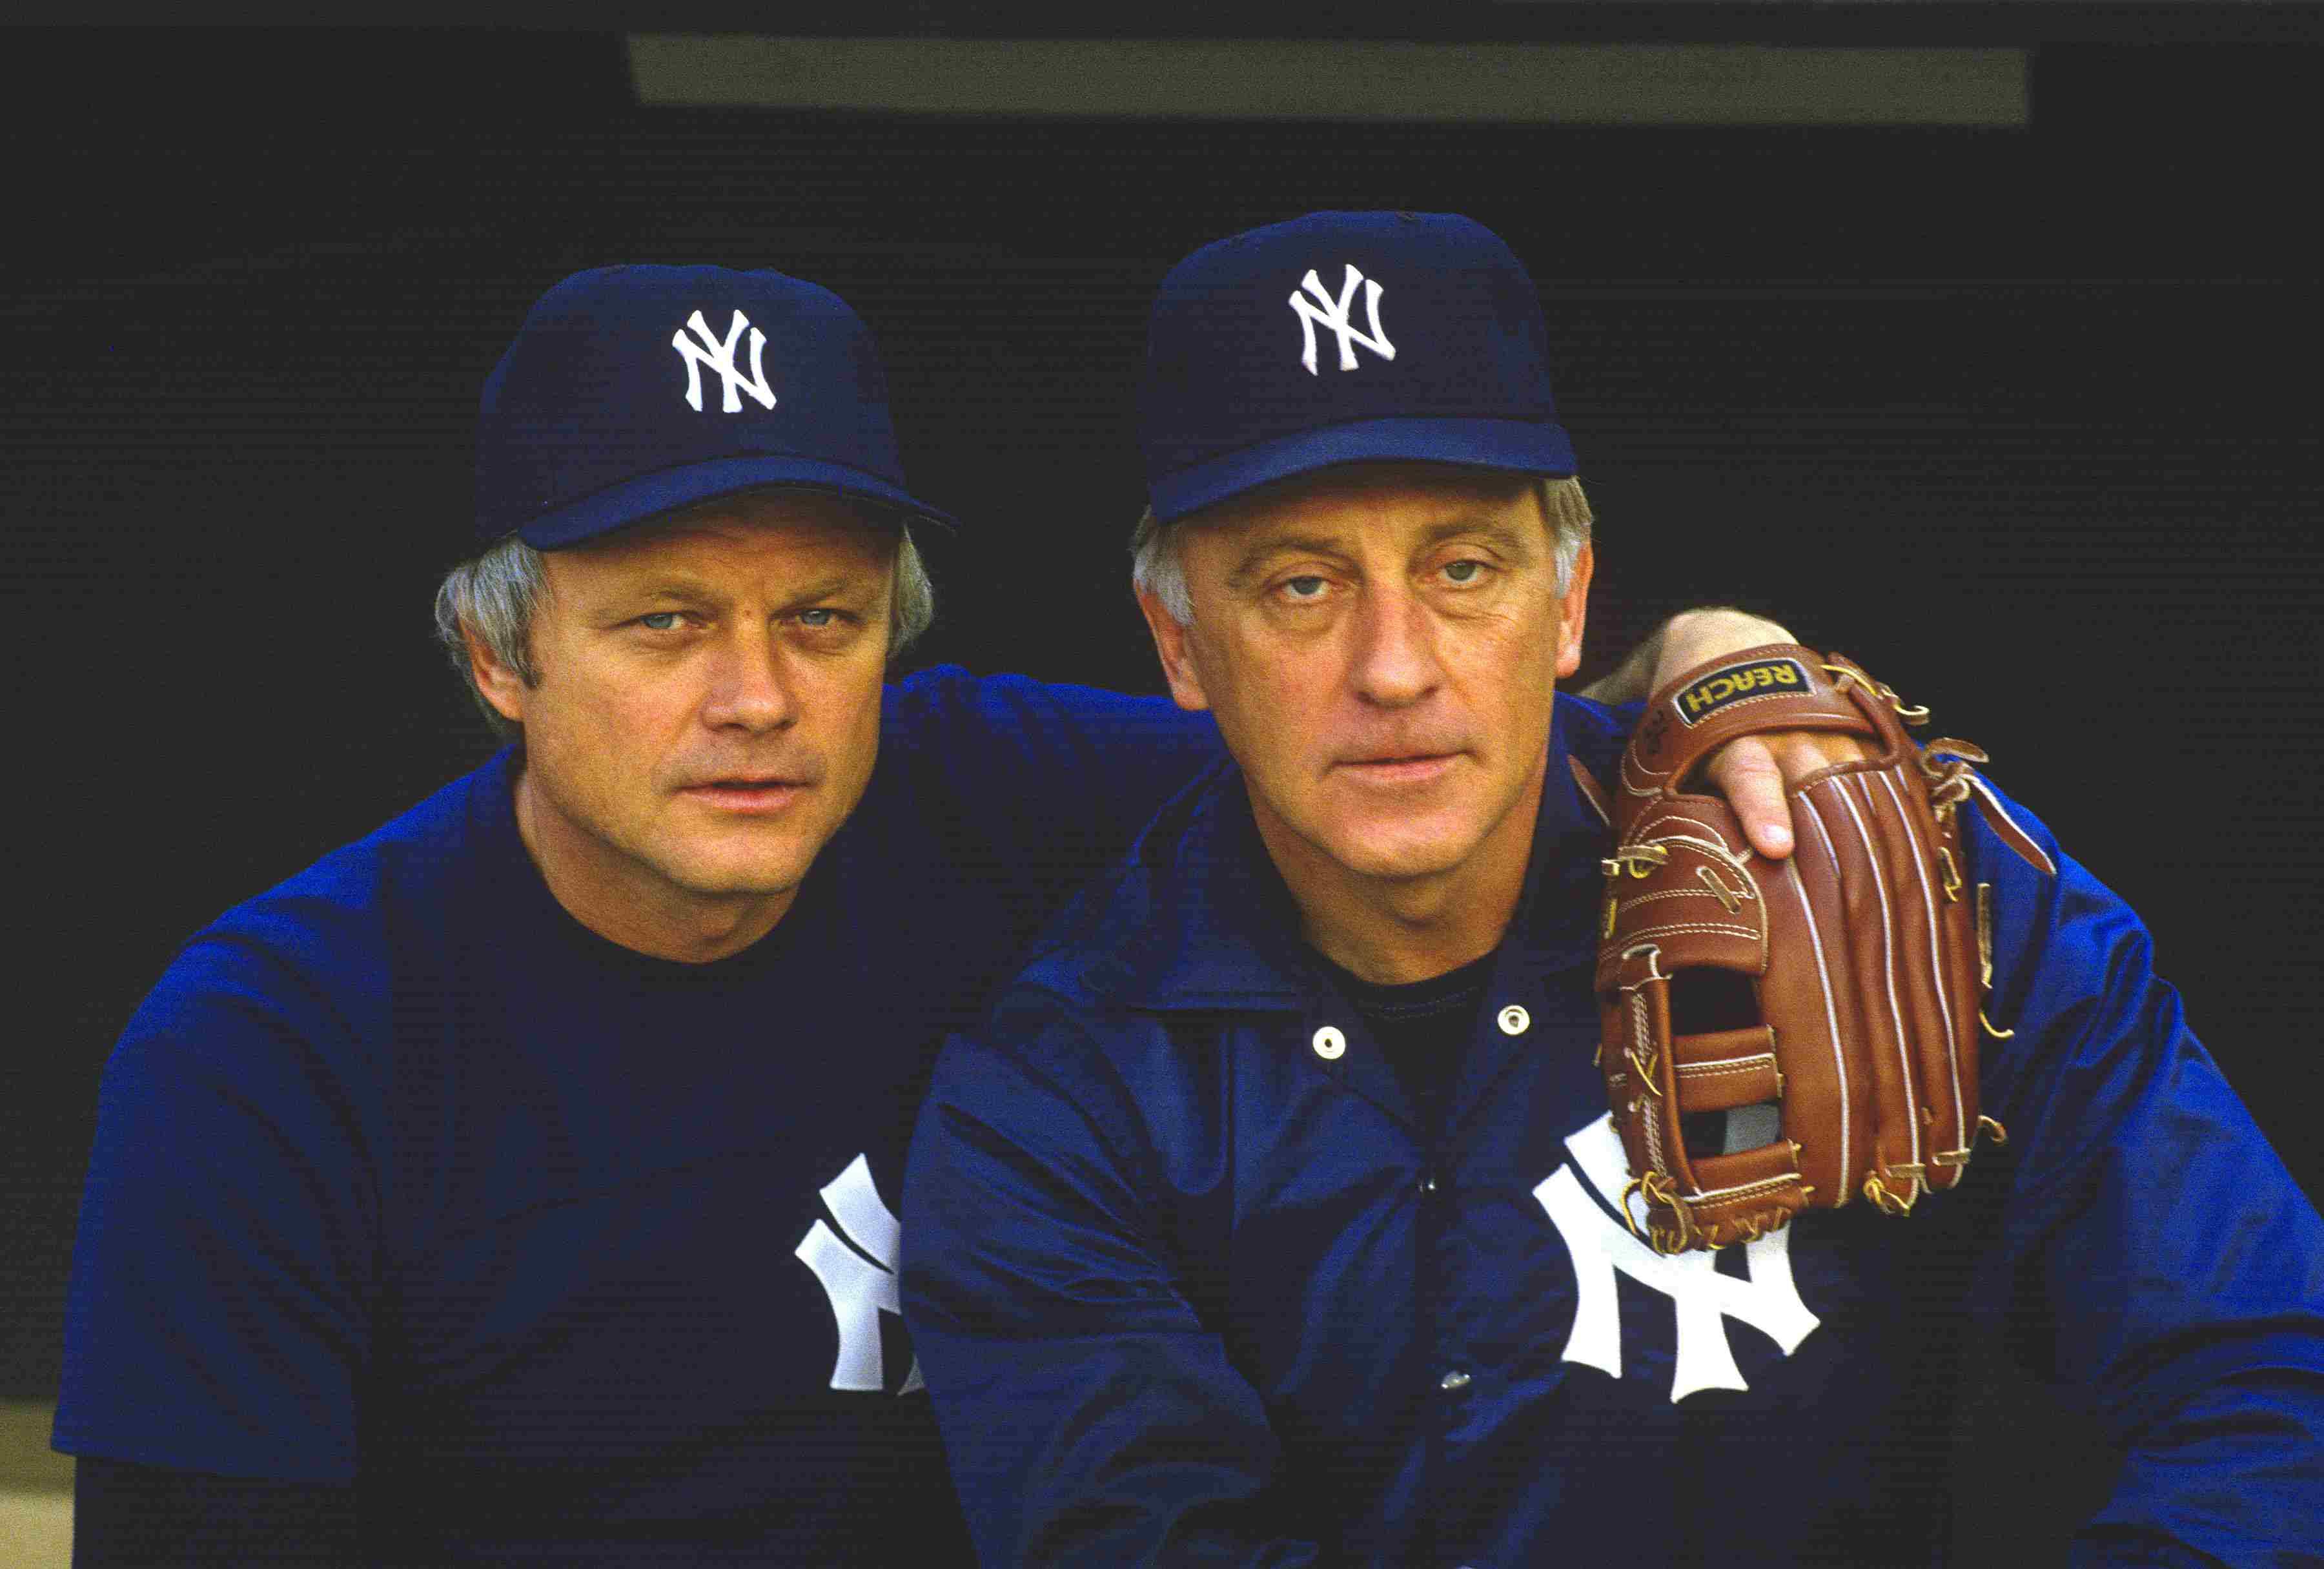 Pitcher Phil Niekro #35 (right) and brother Joe Niekro #31 (left) of the New York Yankees